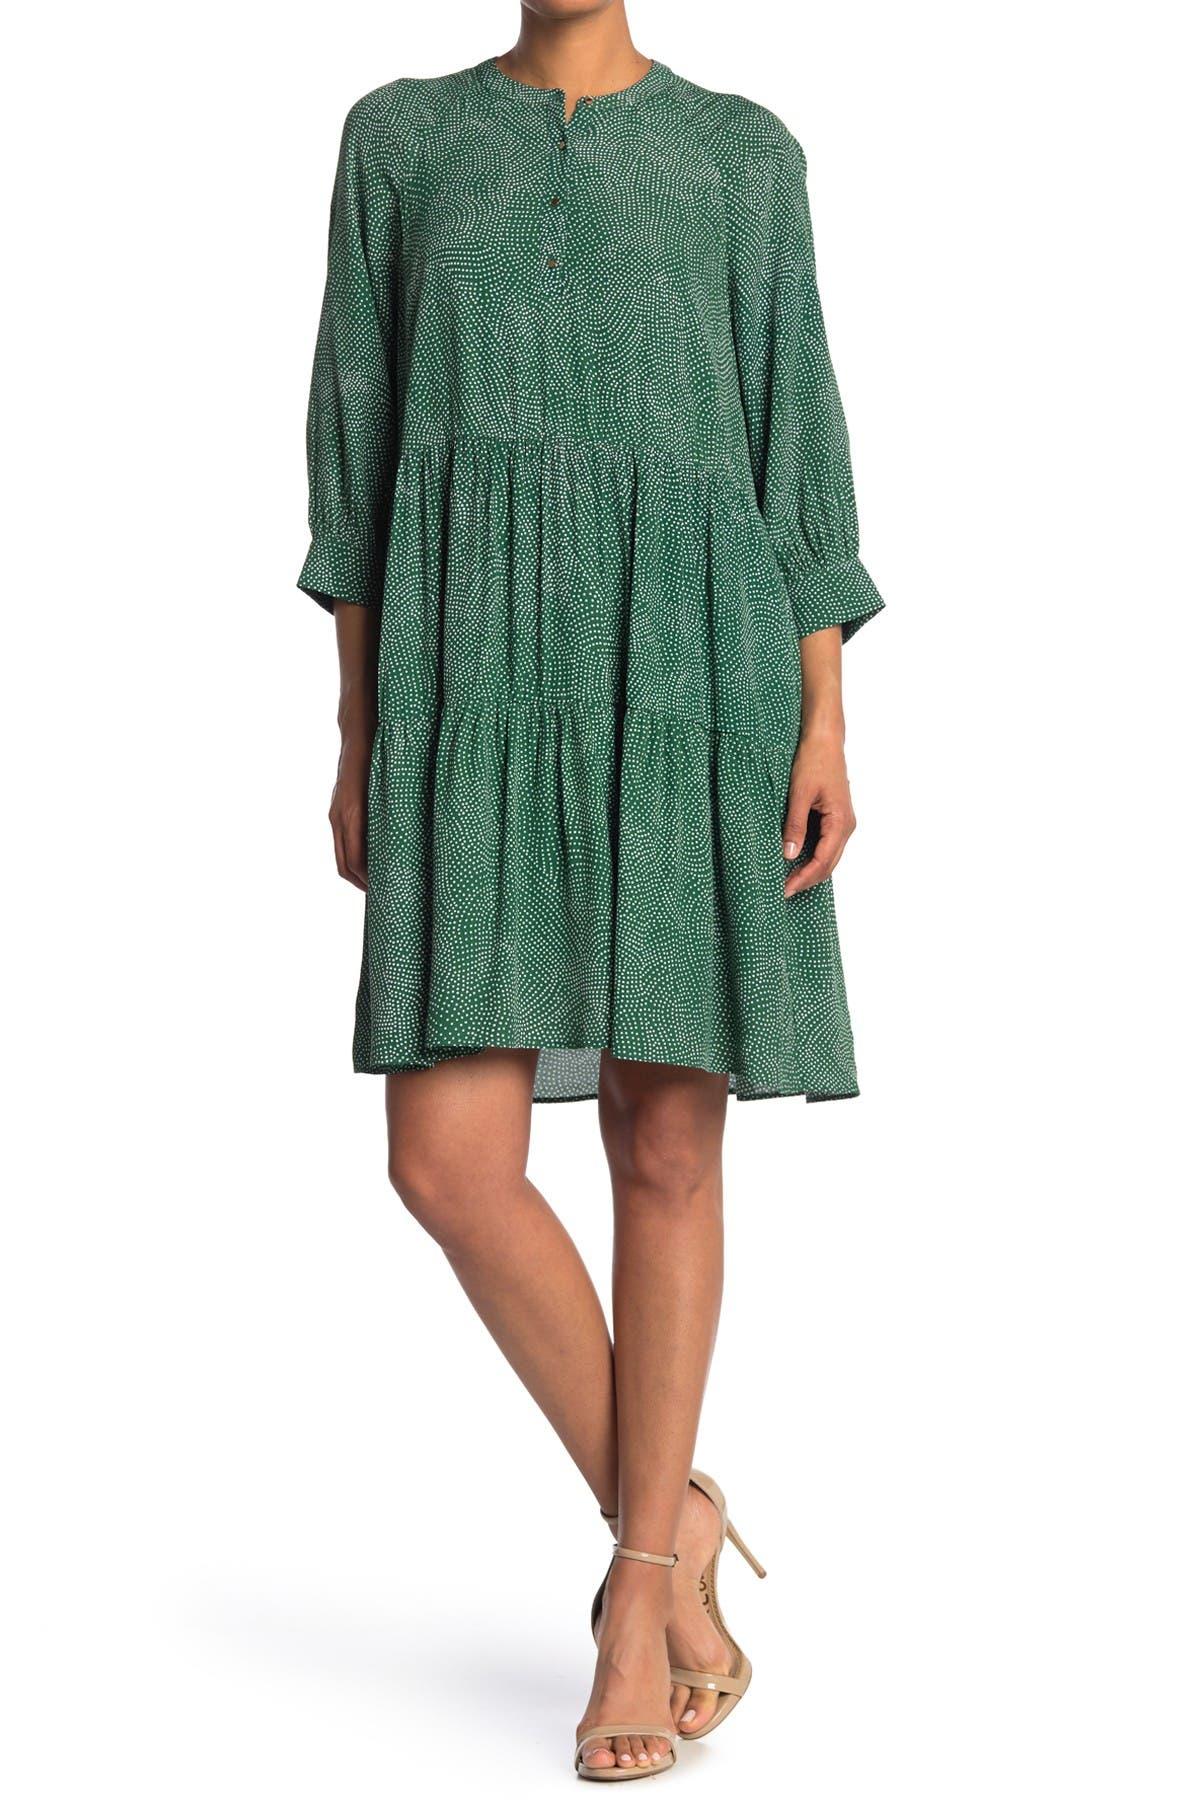 Image of MELLODAY Long Sleeve Tiered Hem Dress